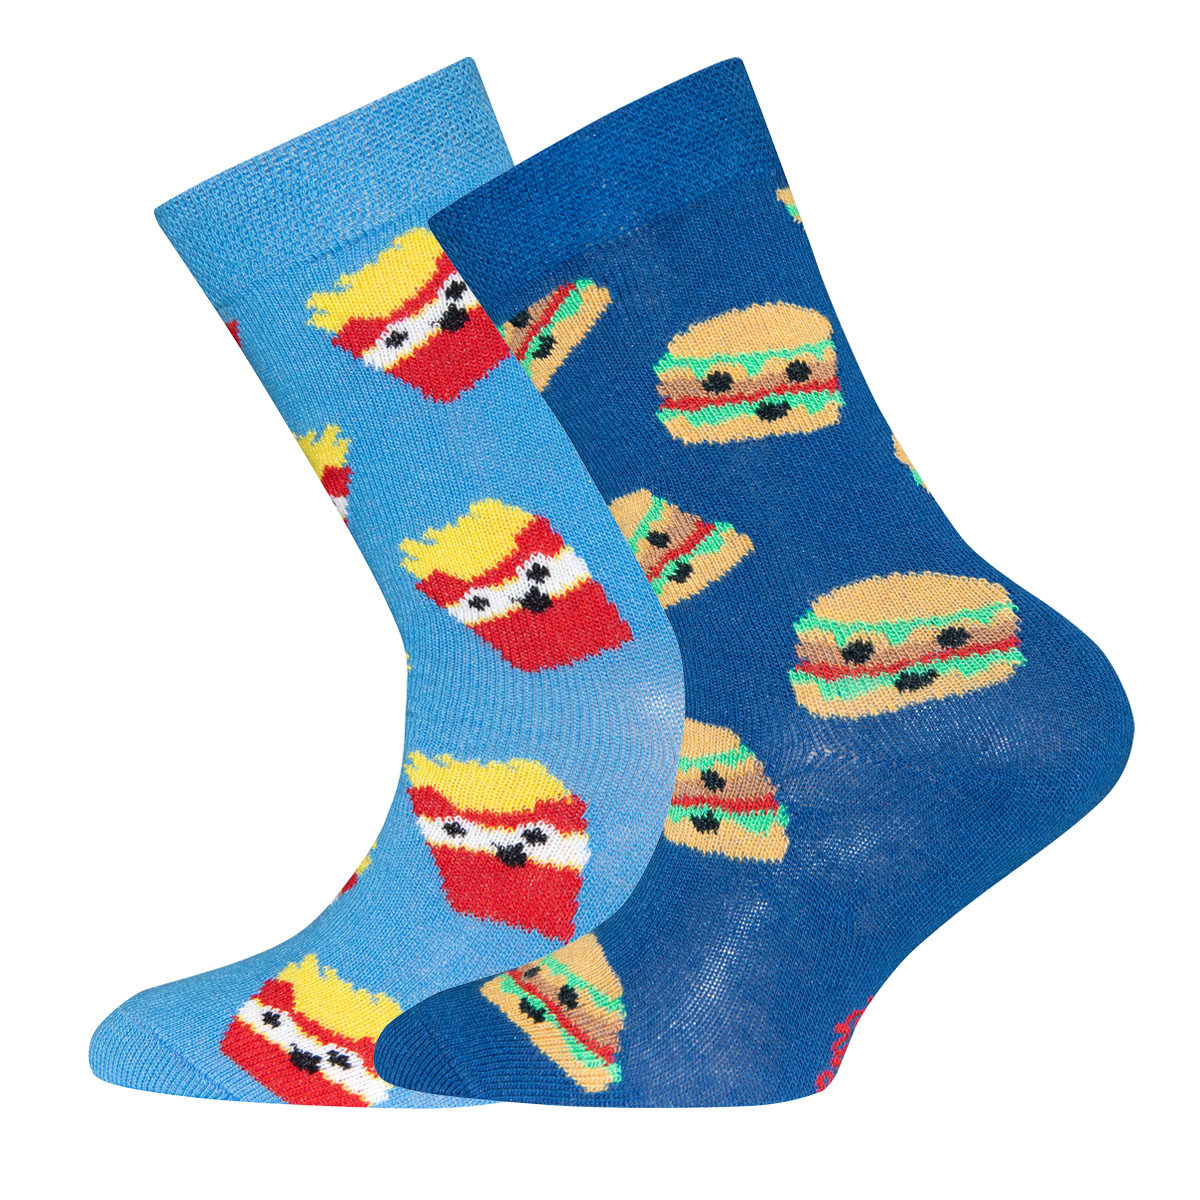 Neupreis heiß-verkaufender Beamter bieten viel Socken 2er Pack Pommes Frites/Hamburger